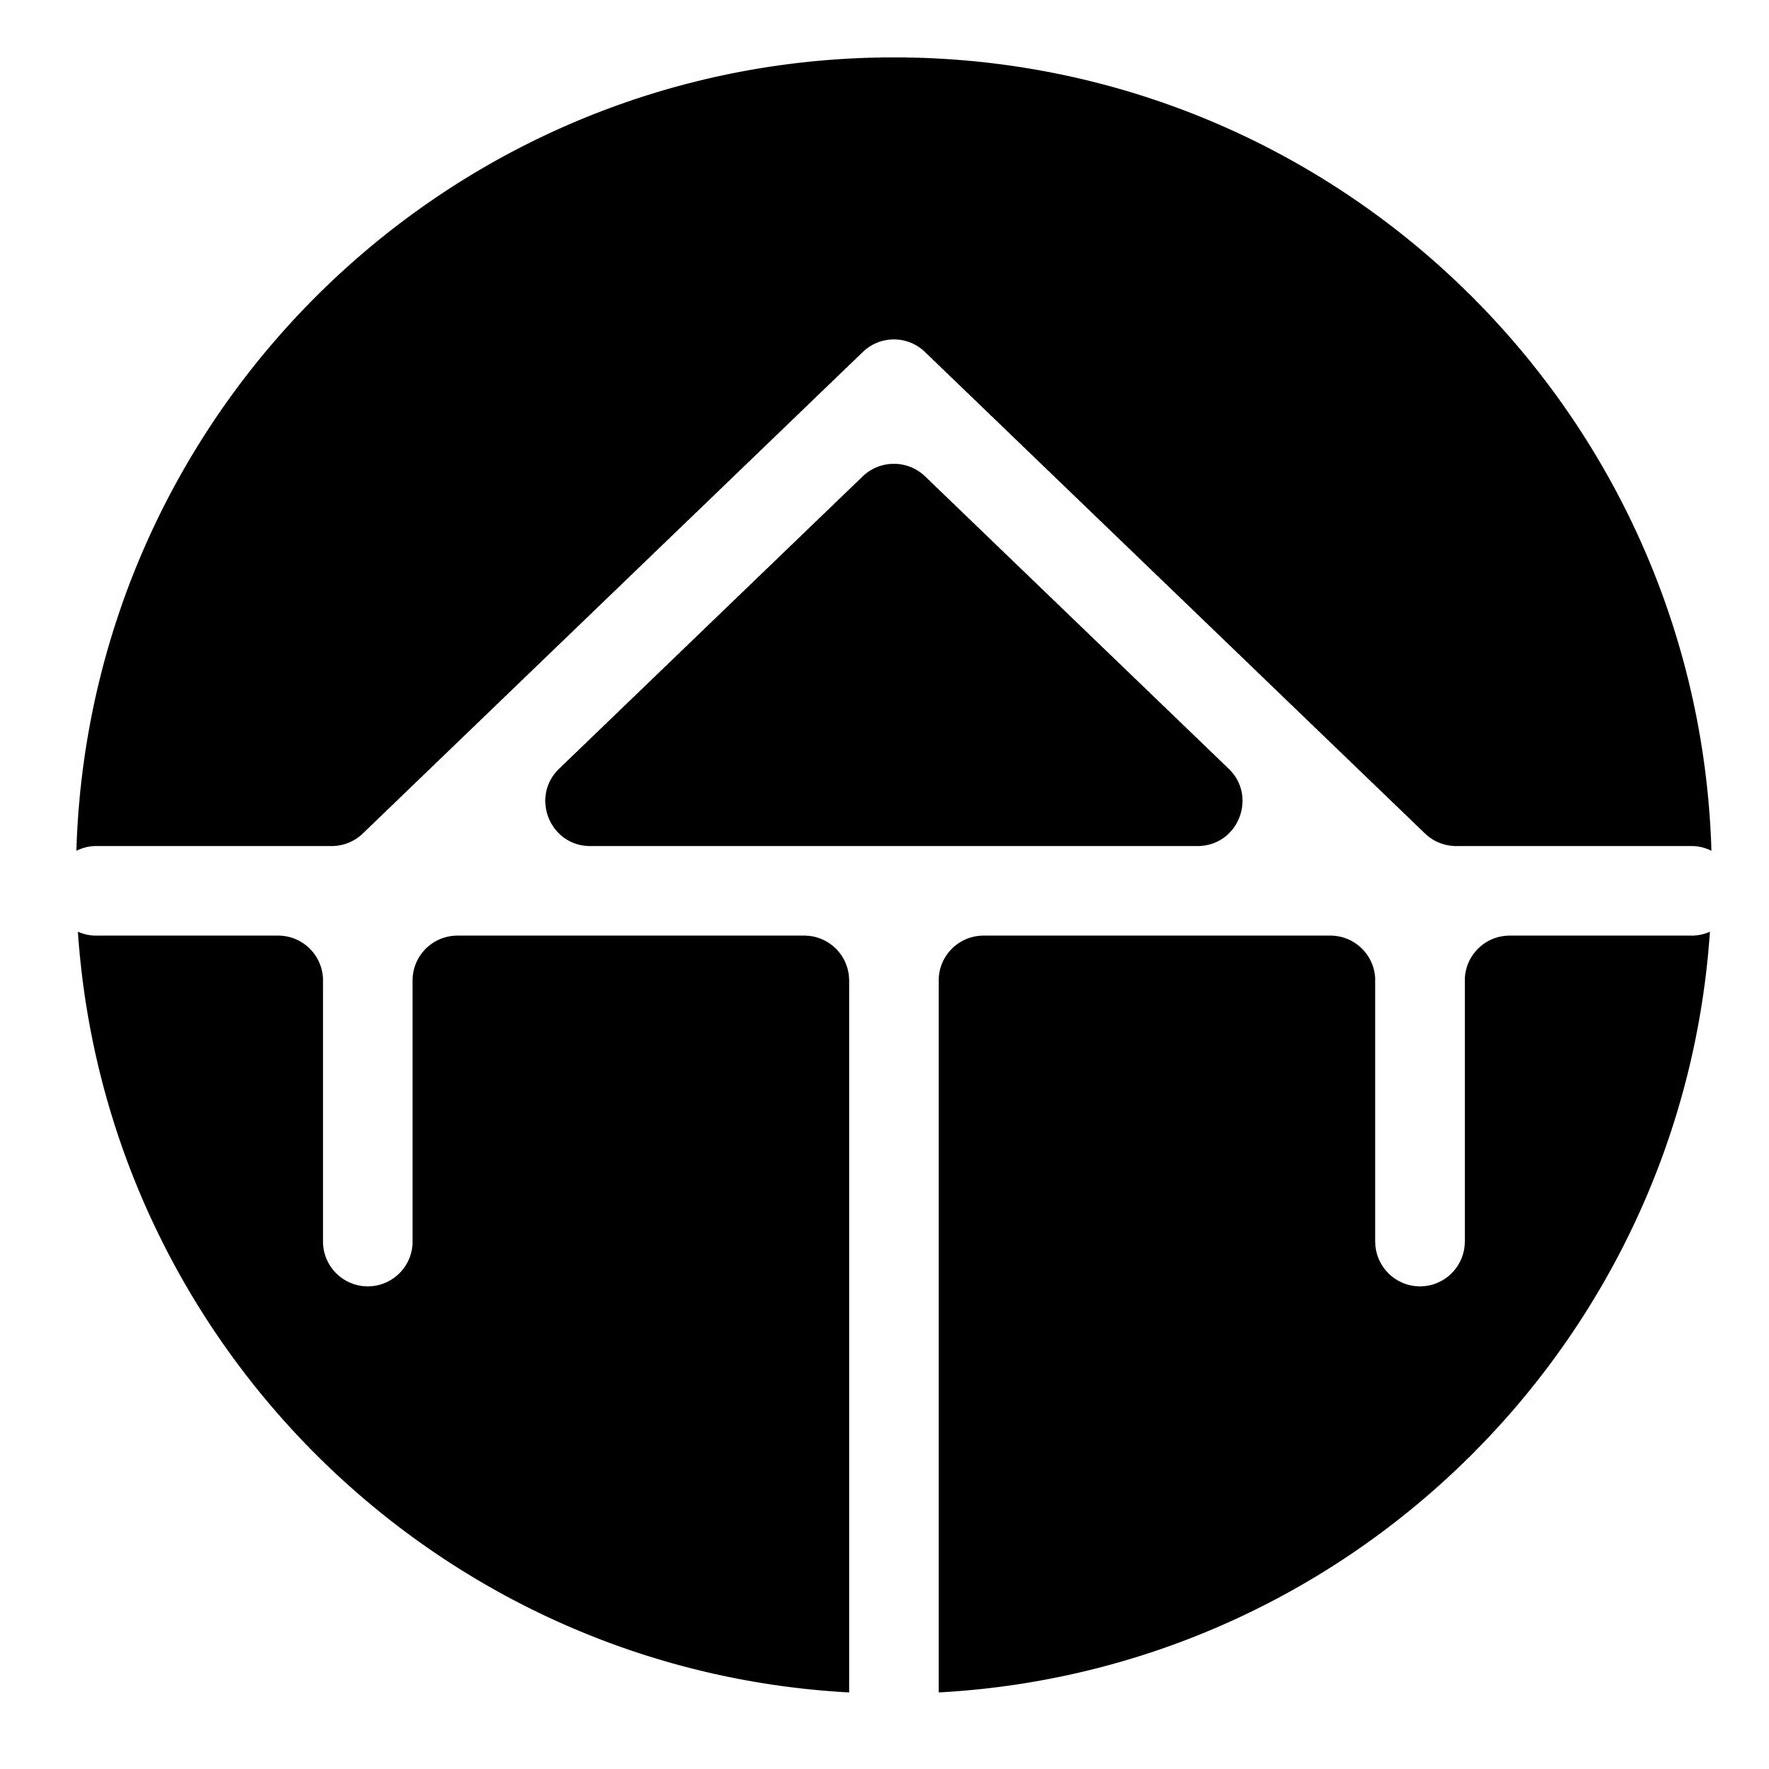 aubrey+thorne+logo.jpg